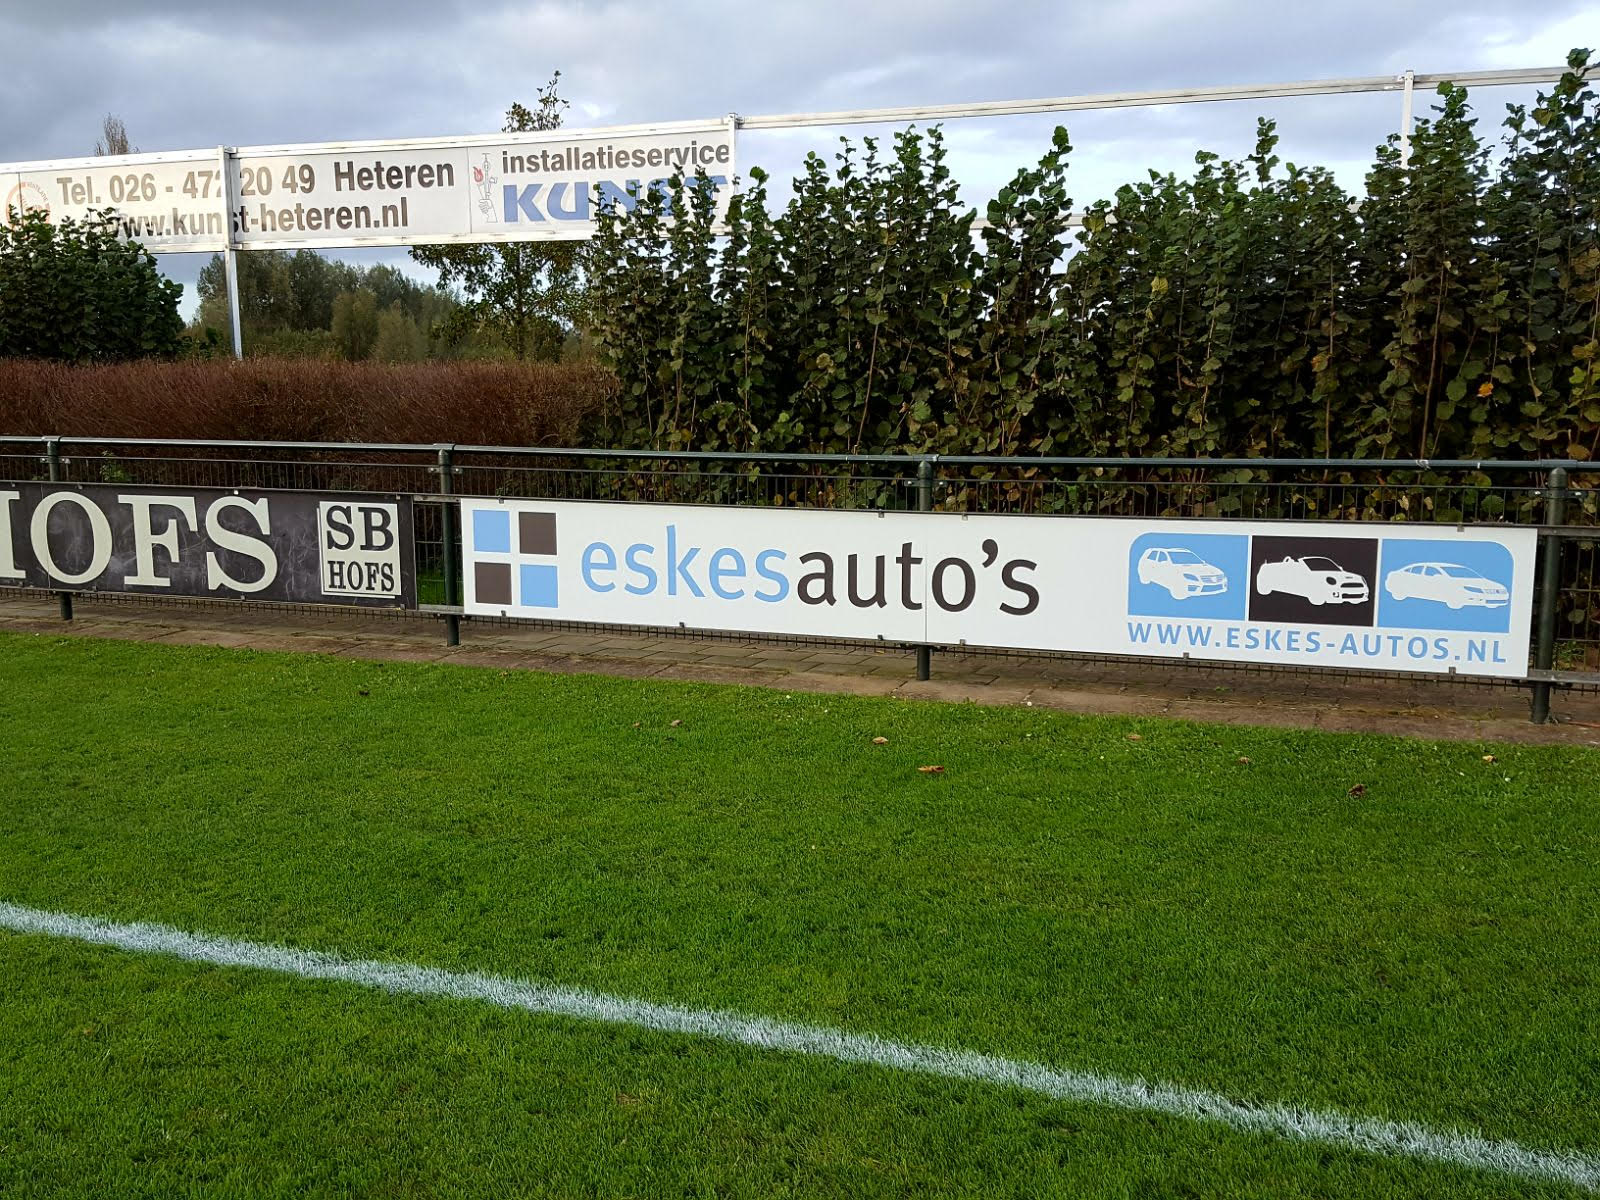 Arnhemse Boys Schuytgraaf | Eskes Auto's